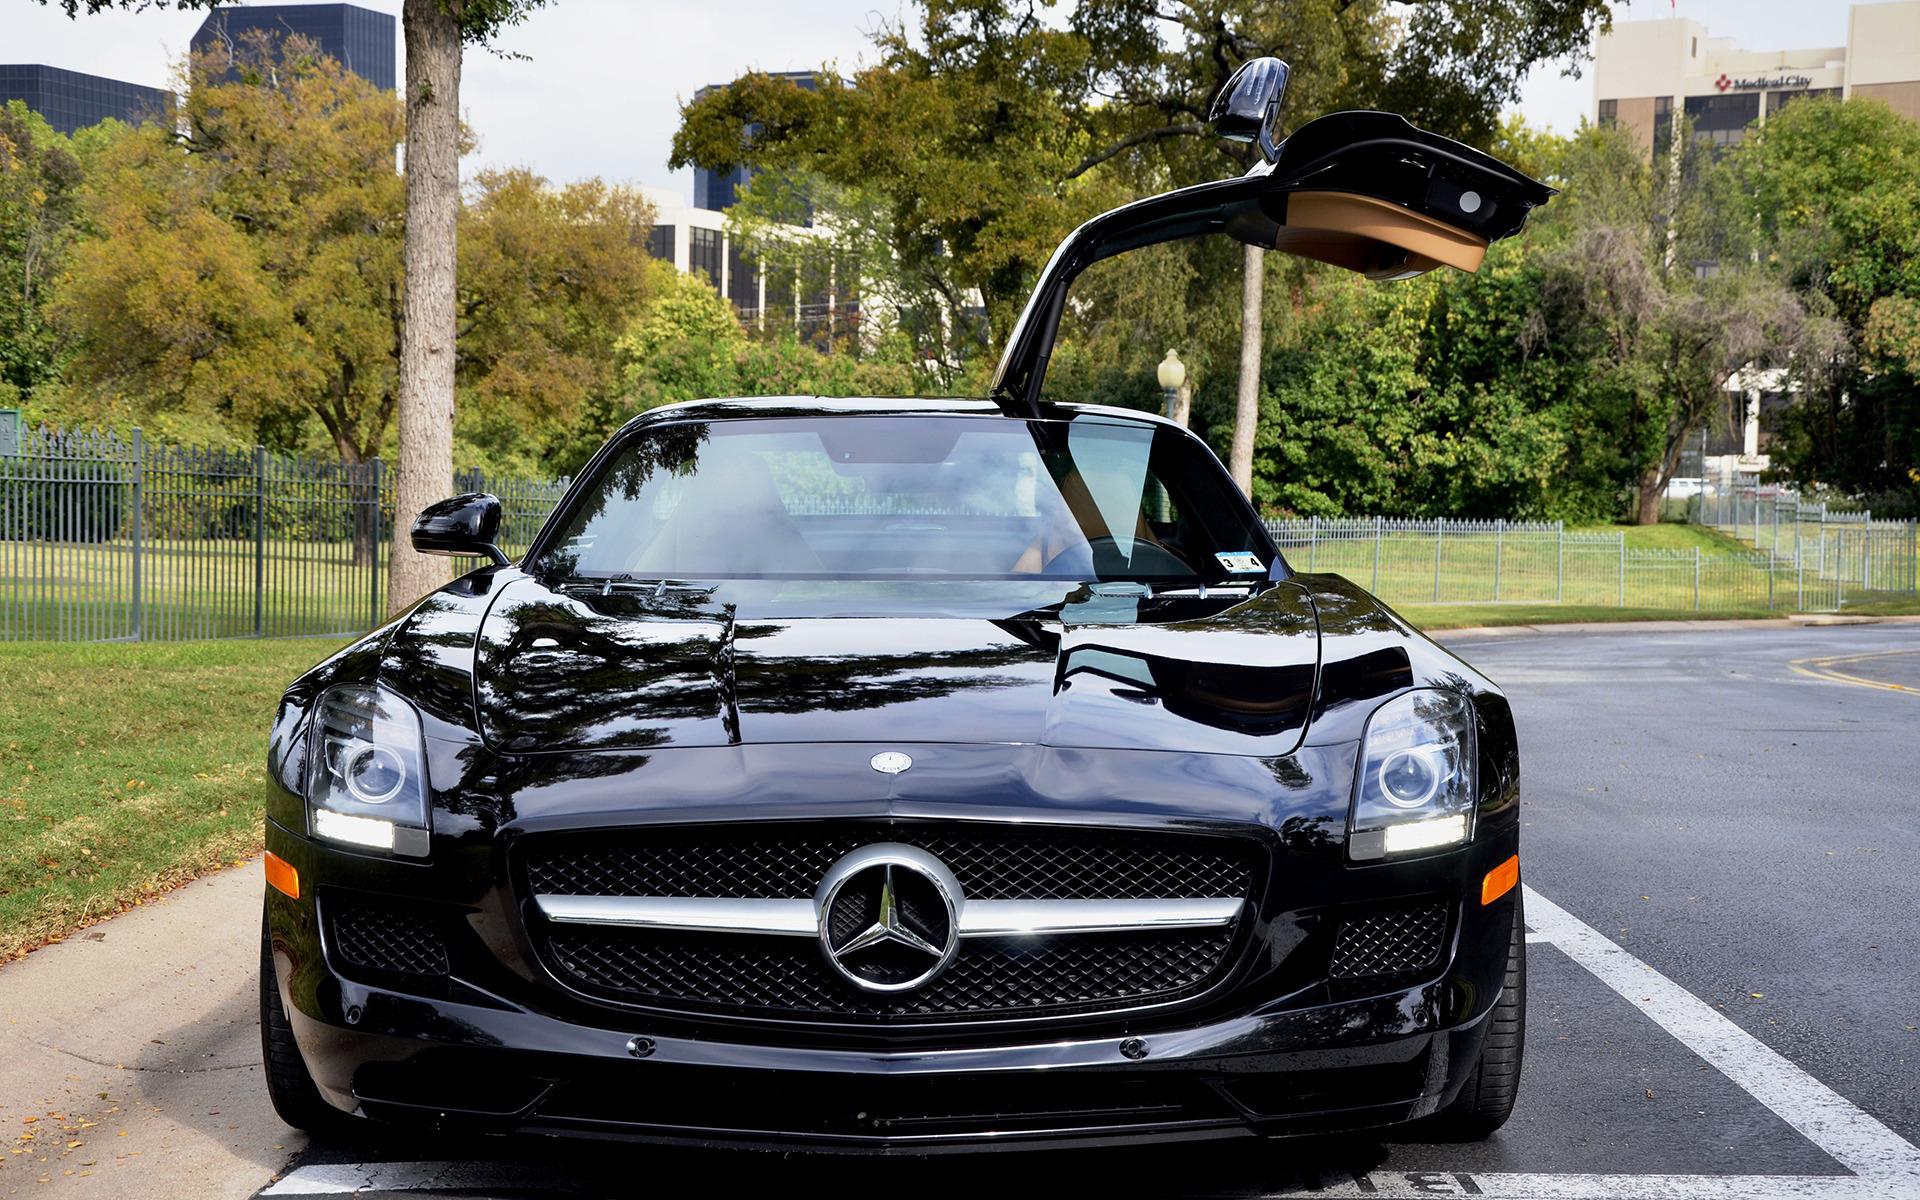 2011 mercedes benz sls amg stock 135995 for sale near for Mercedes benz dealership dallas texas